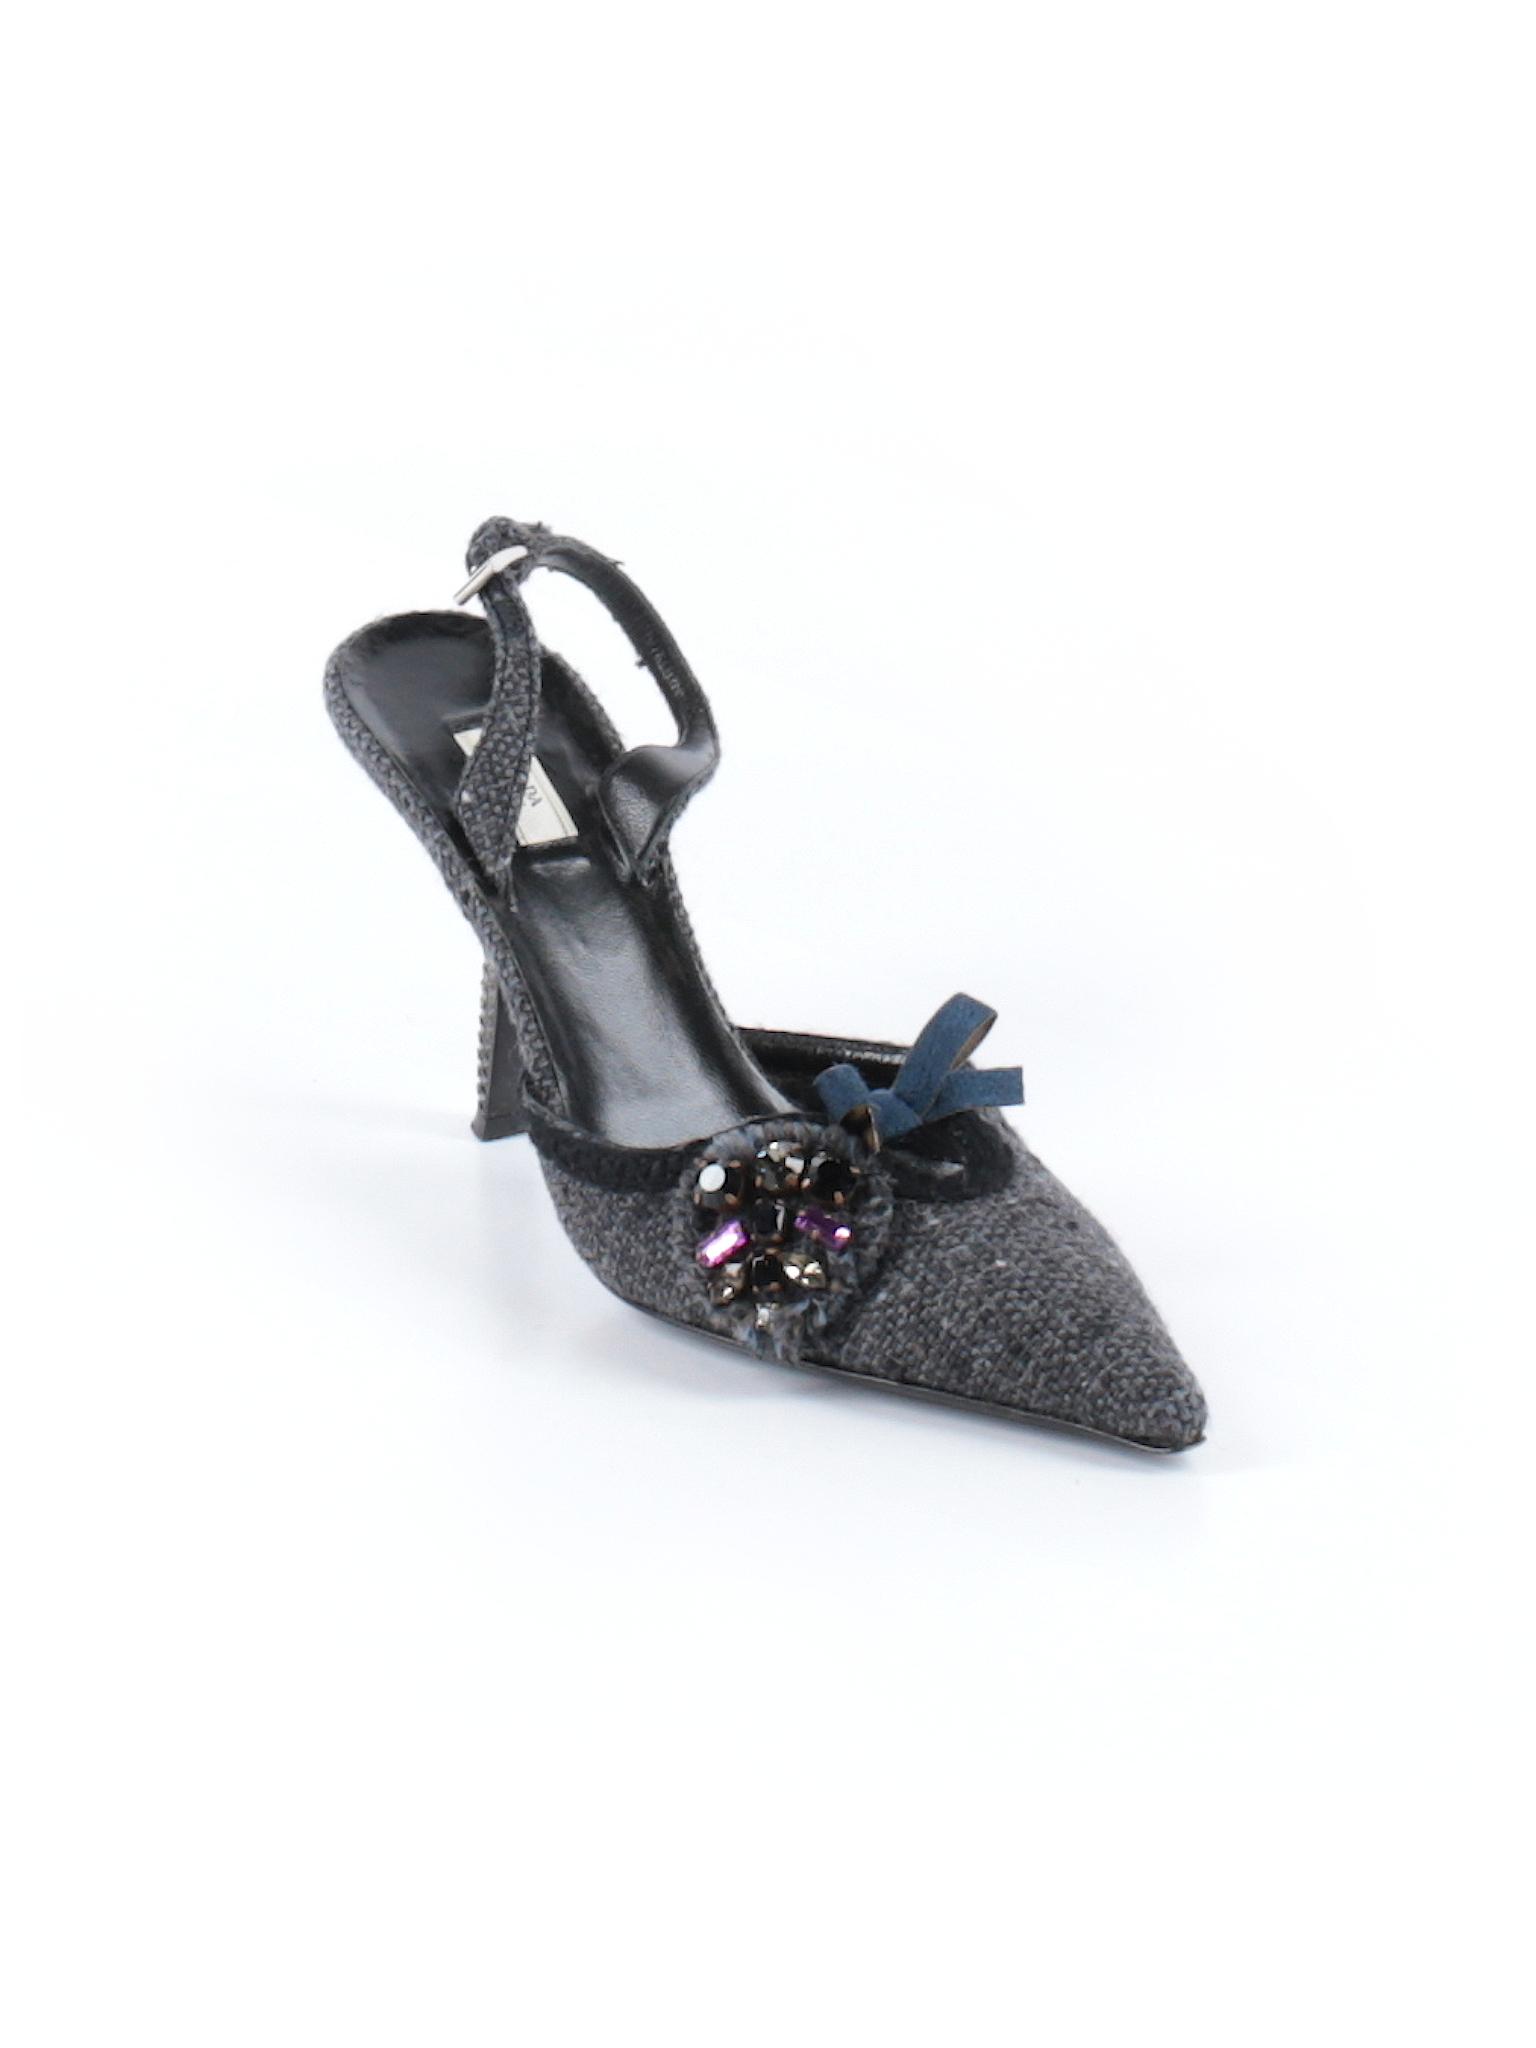 Boutique promotion Prada promotion Boutique Heels Boutique Prada Heels BSpBwOq8x